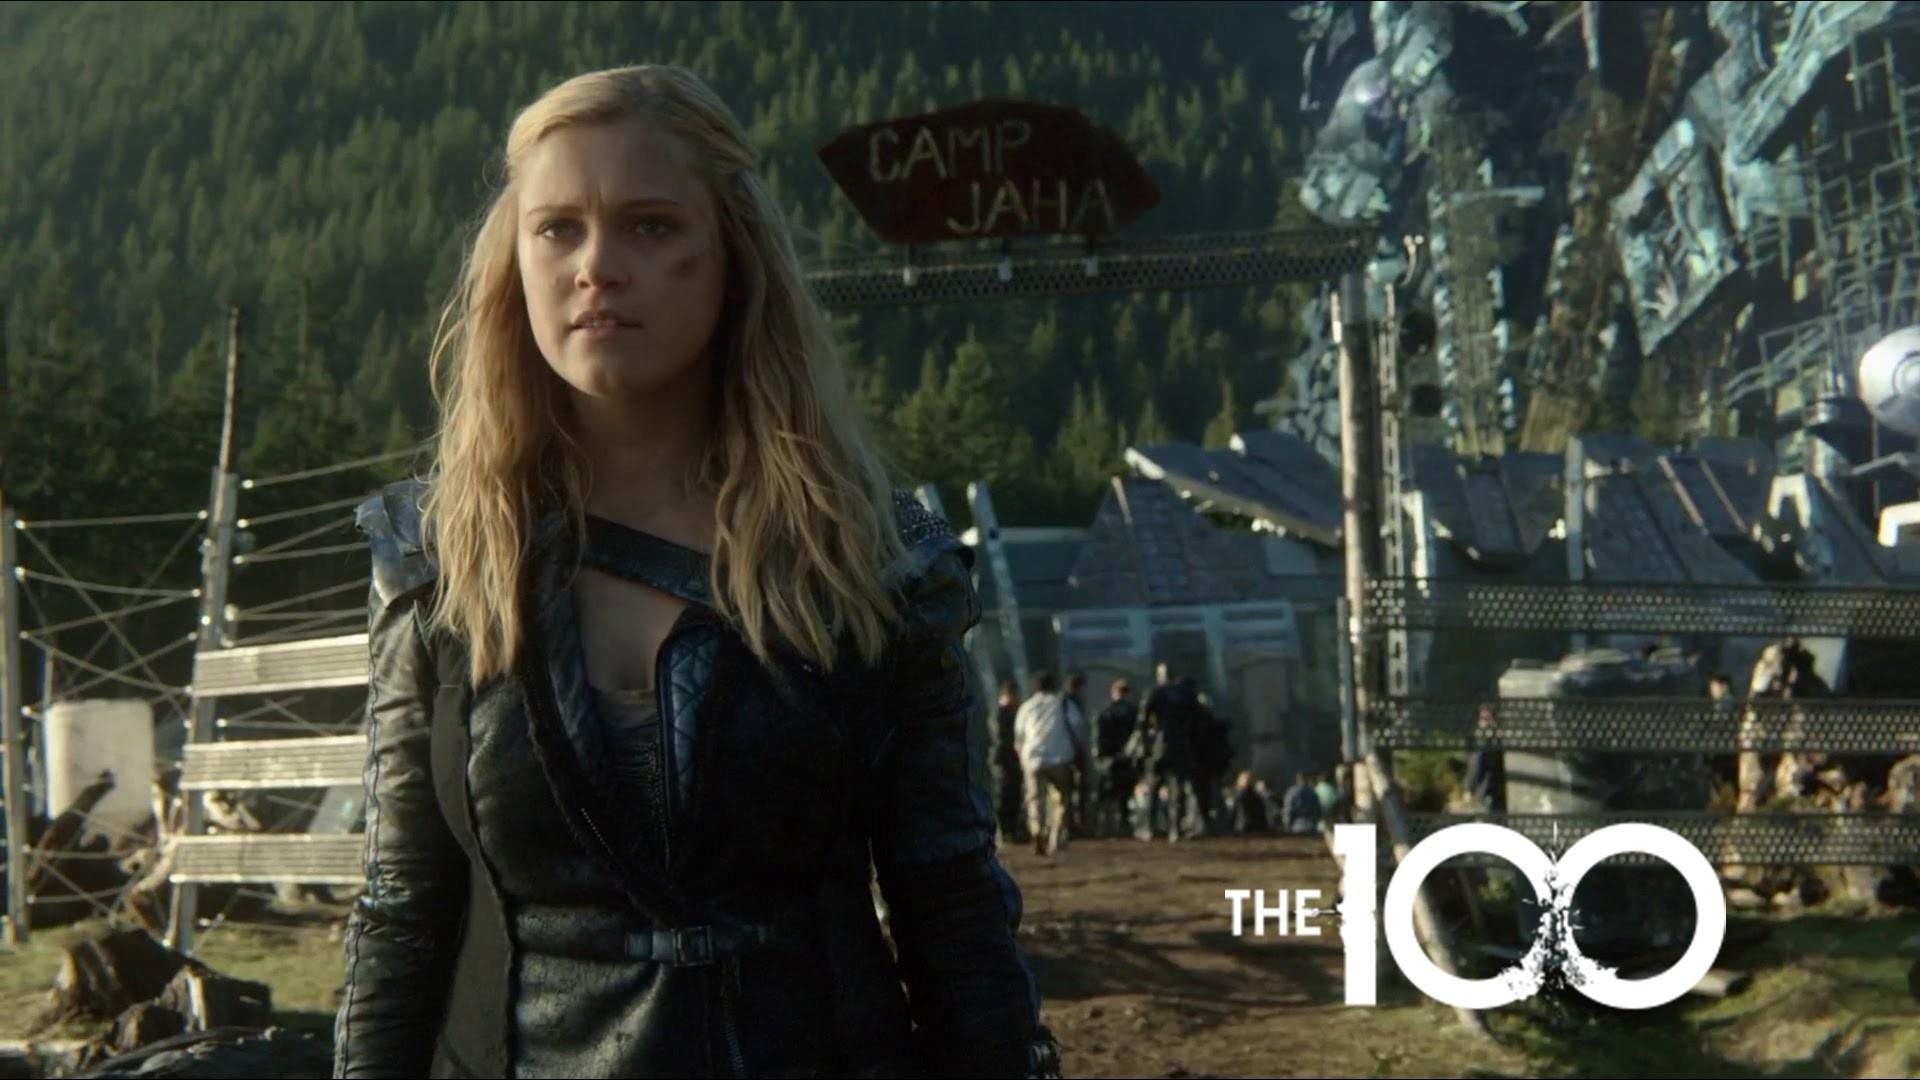 The 100 Season 2 Ending (Bellamy and Clarke) (1080p WEB DL)